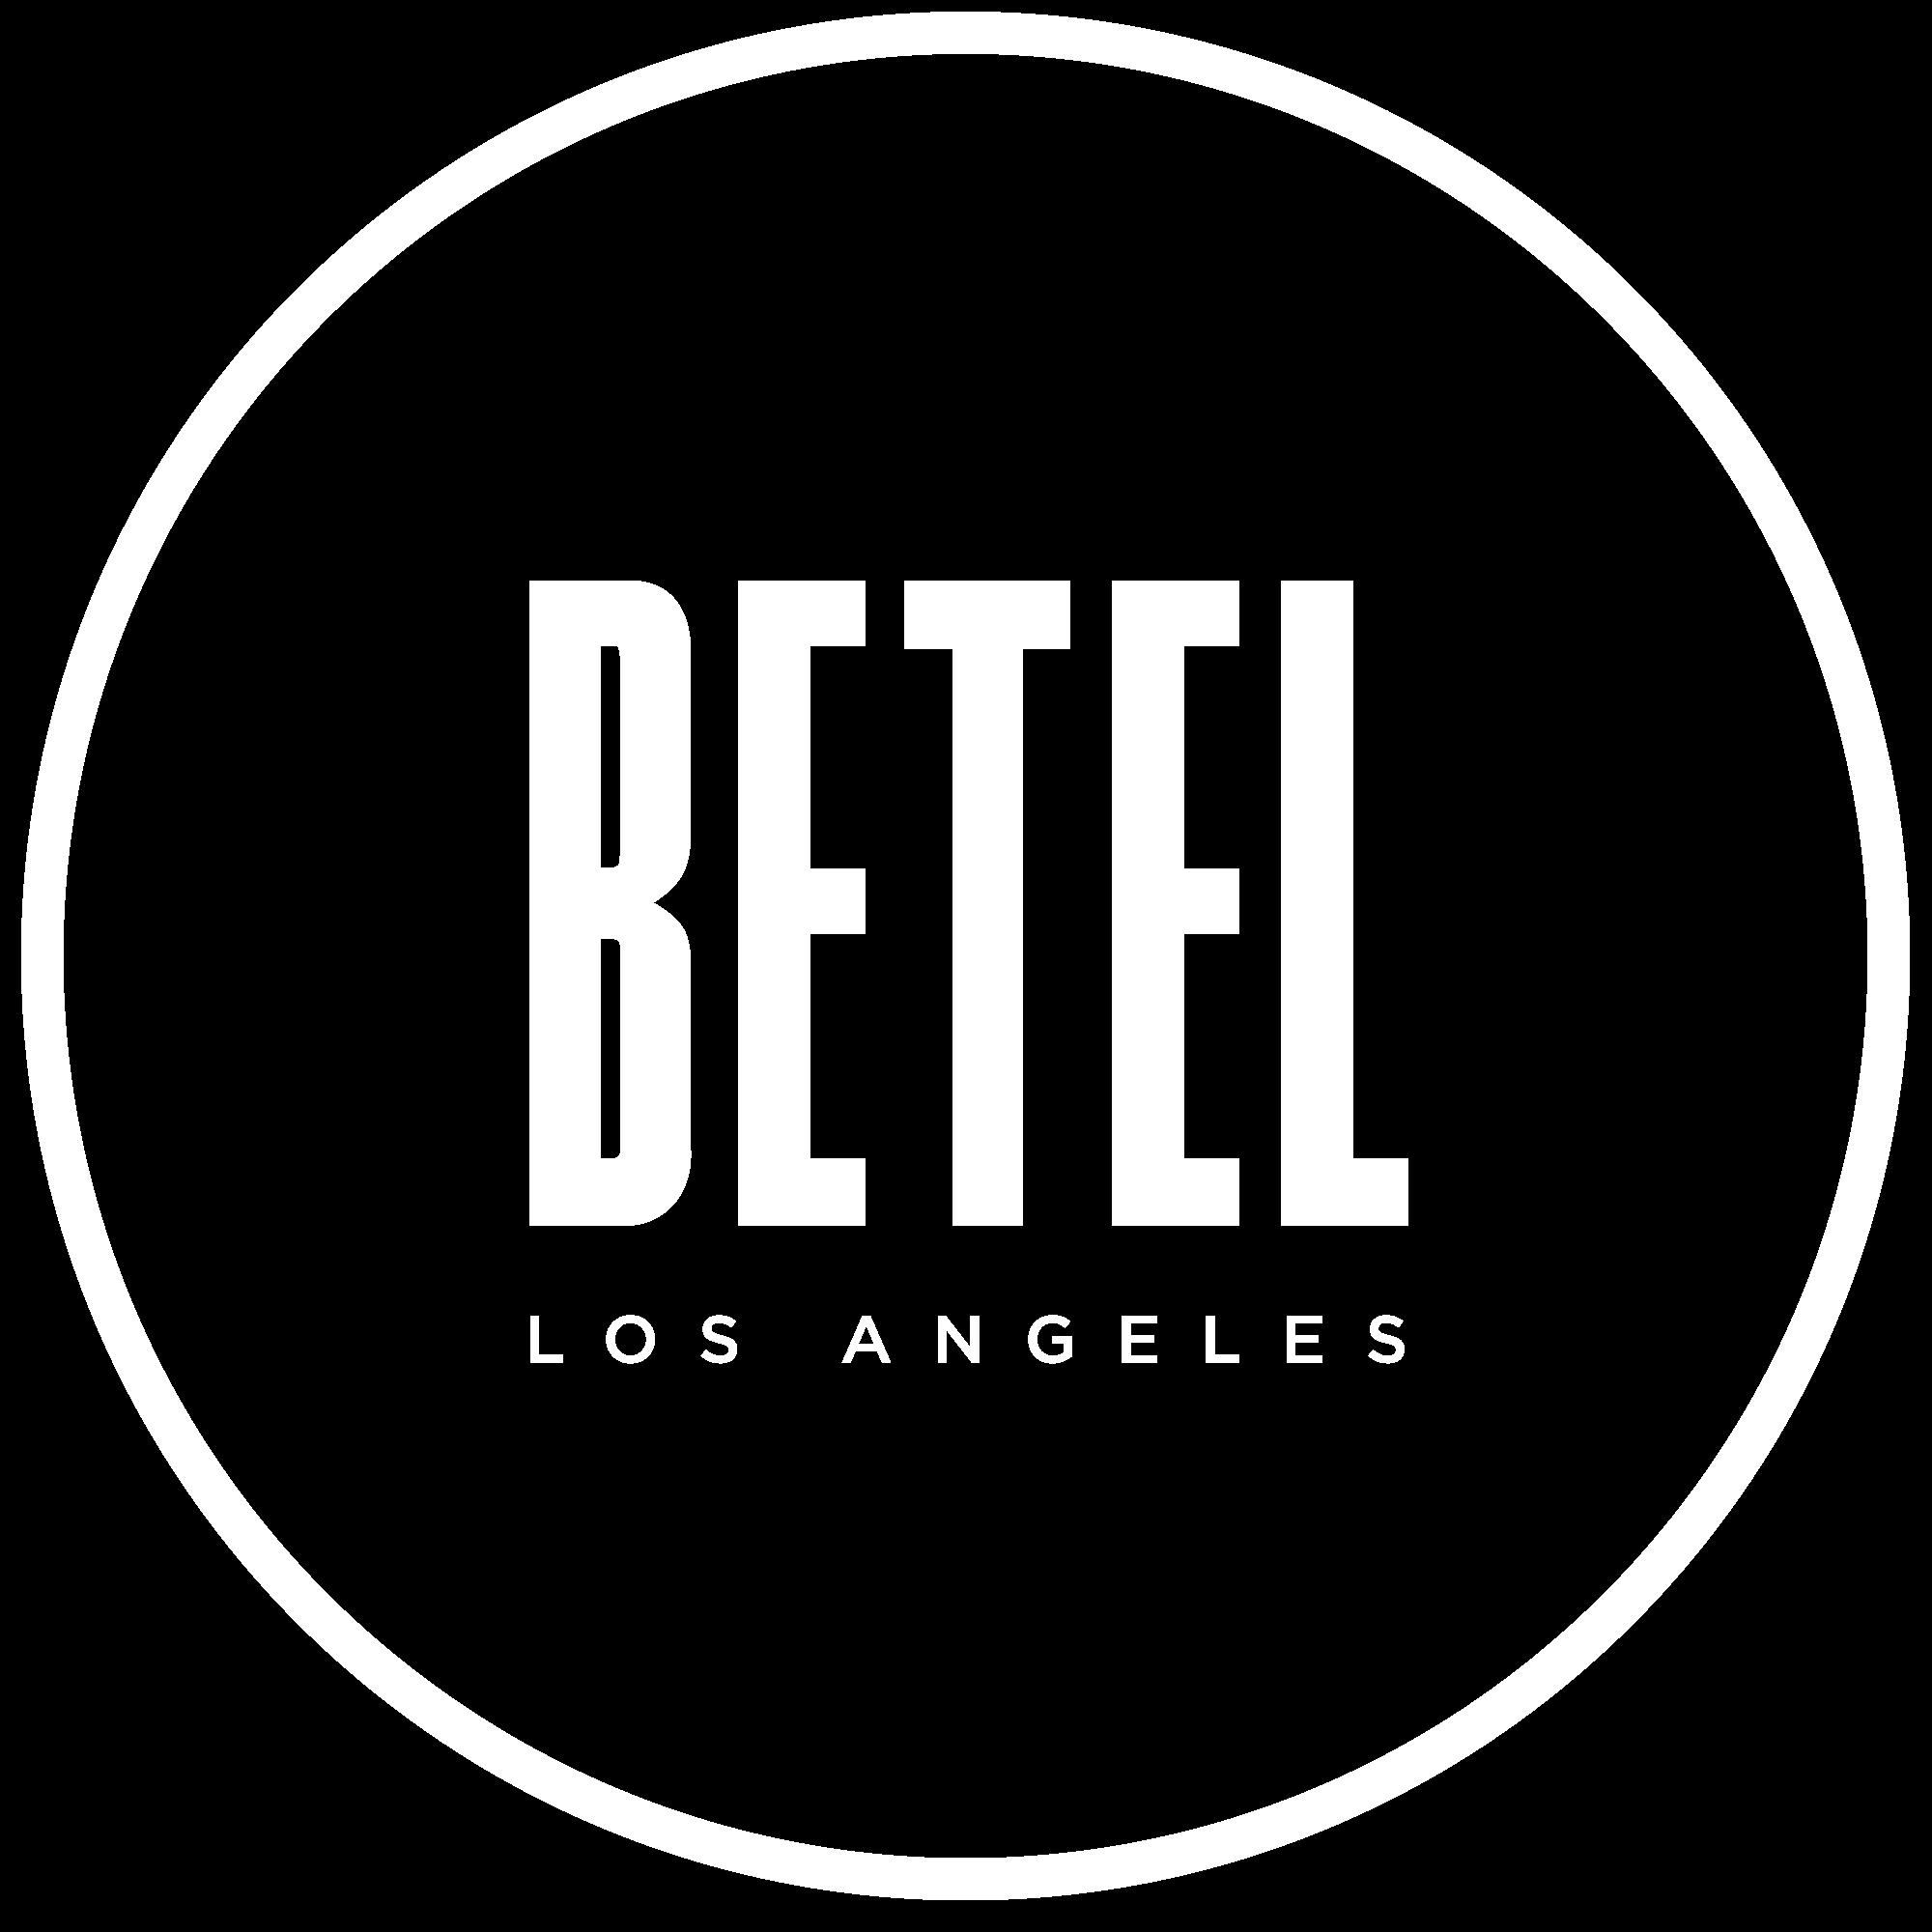 Betel